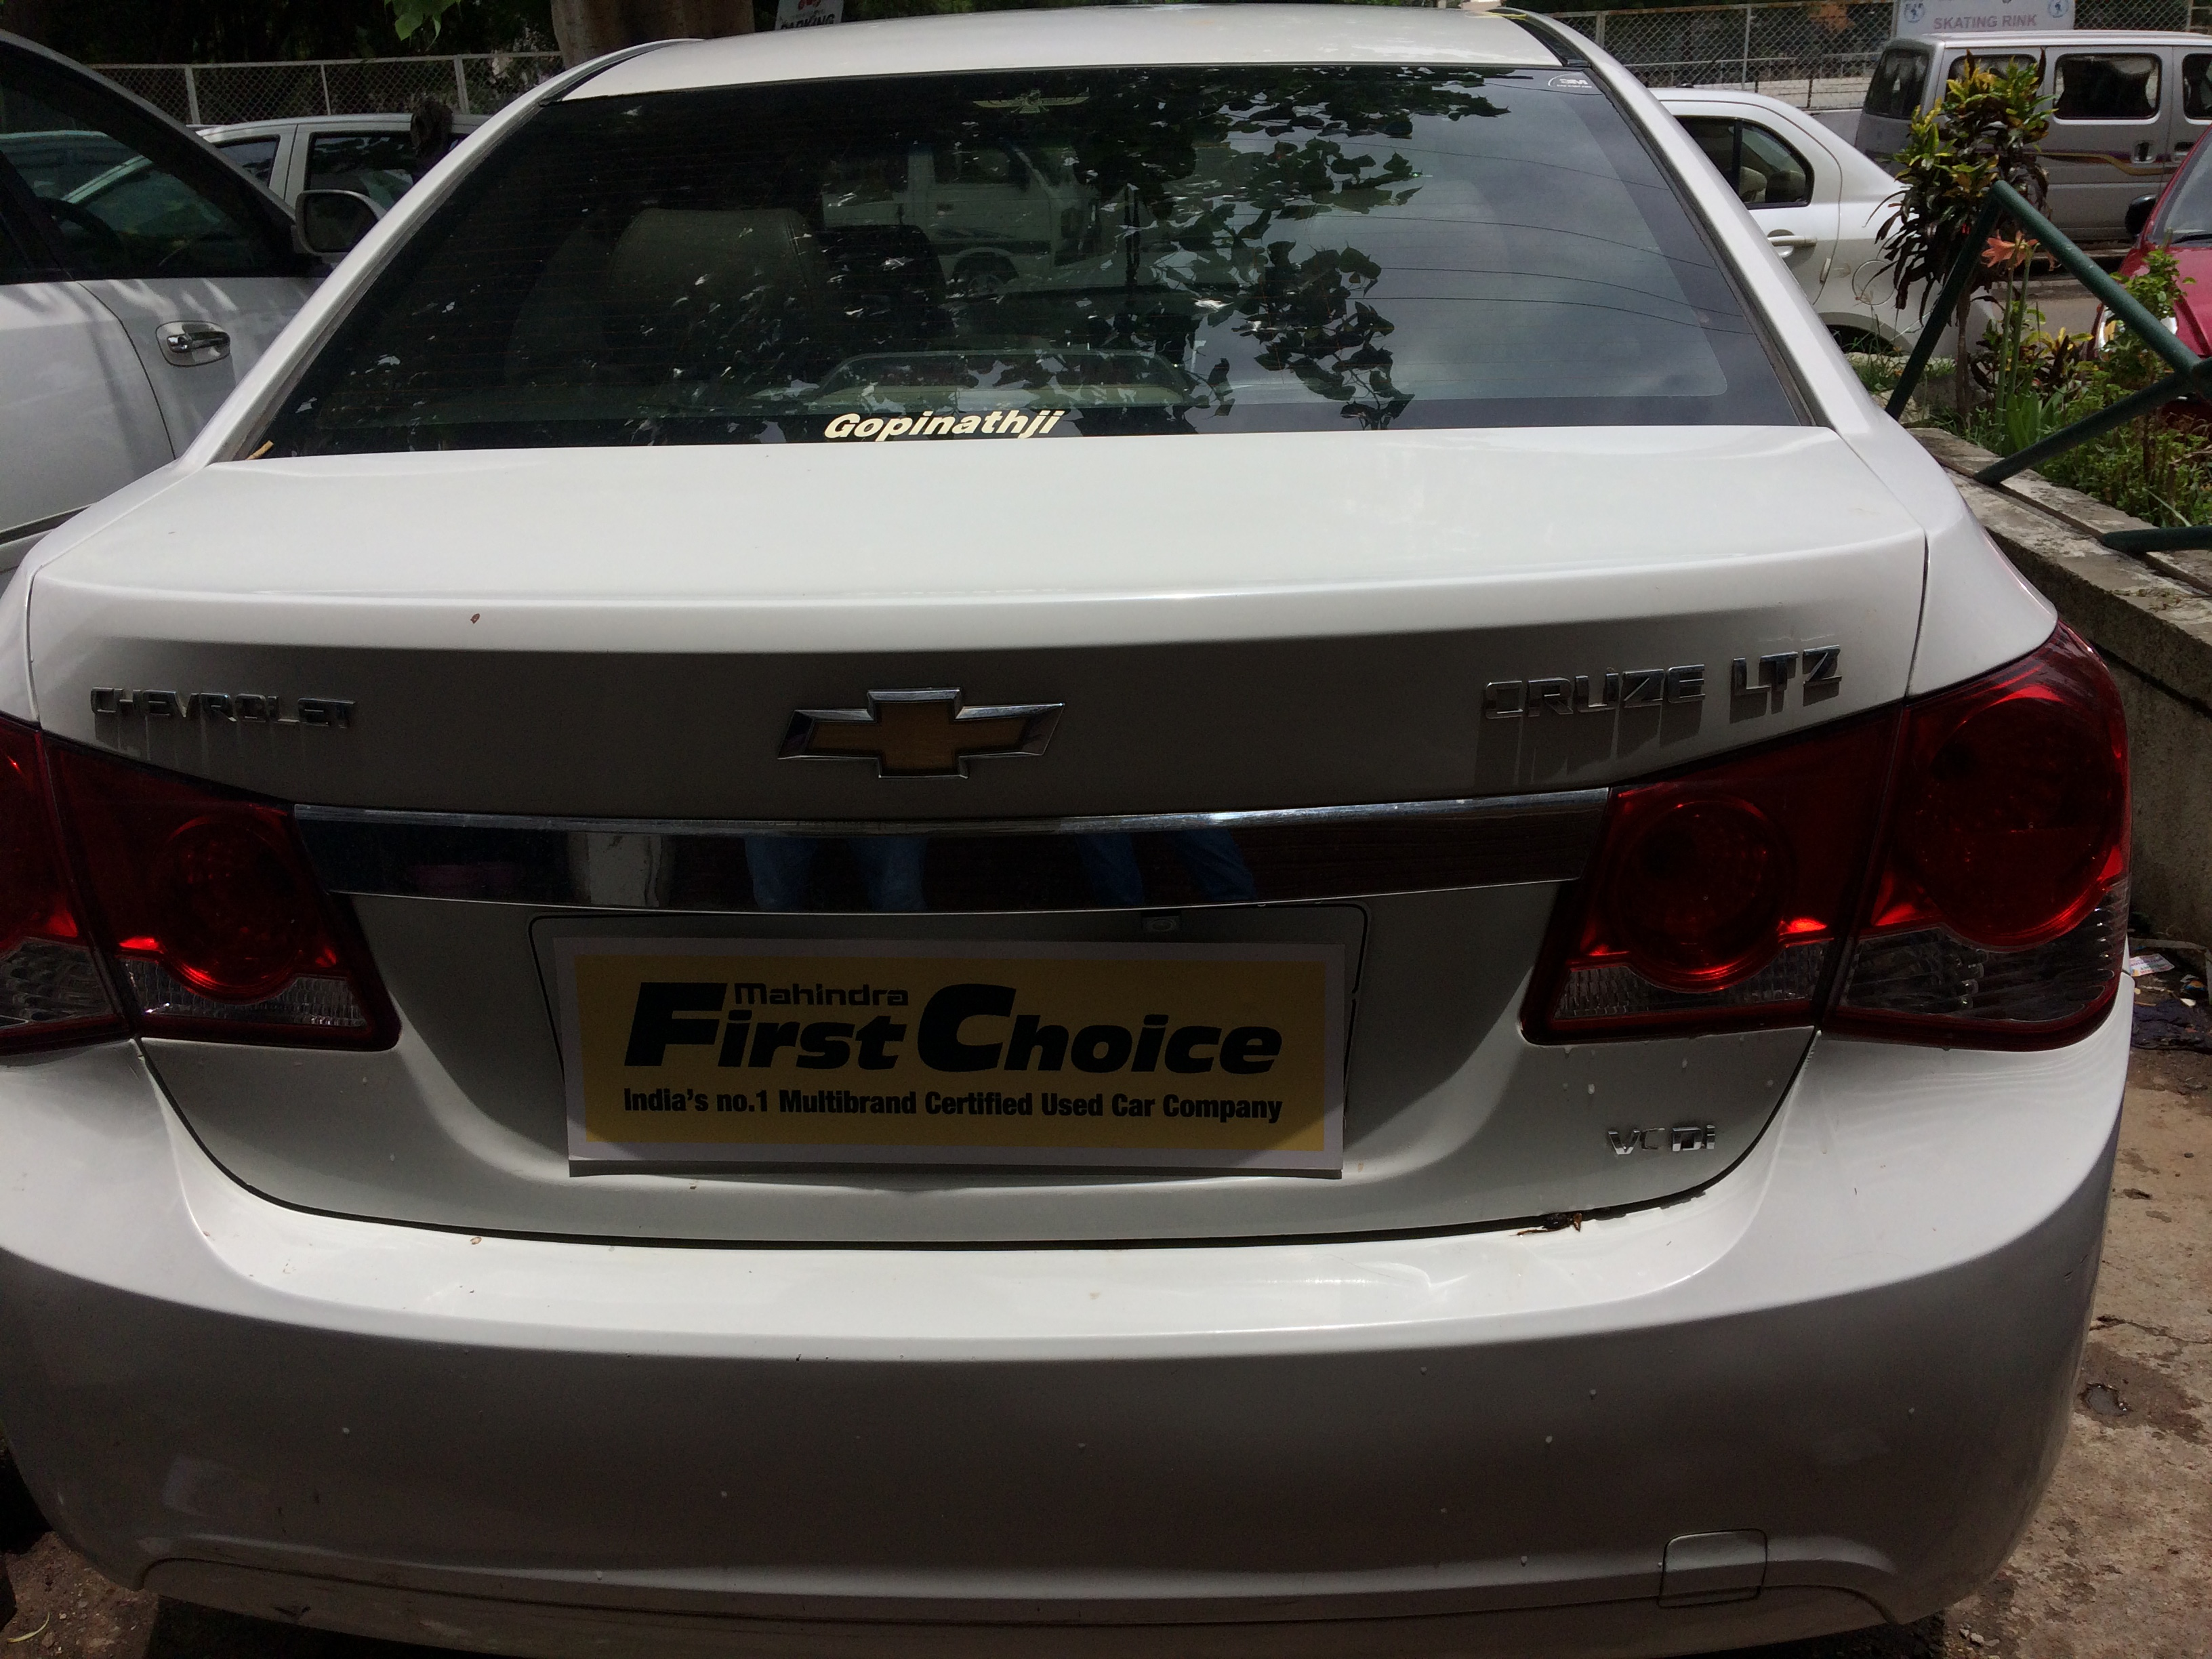 2010 Used Chevrolet Cruze LTZ